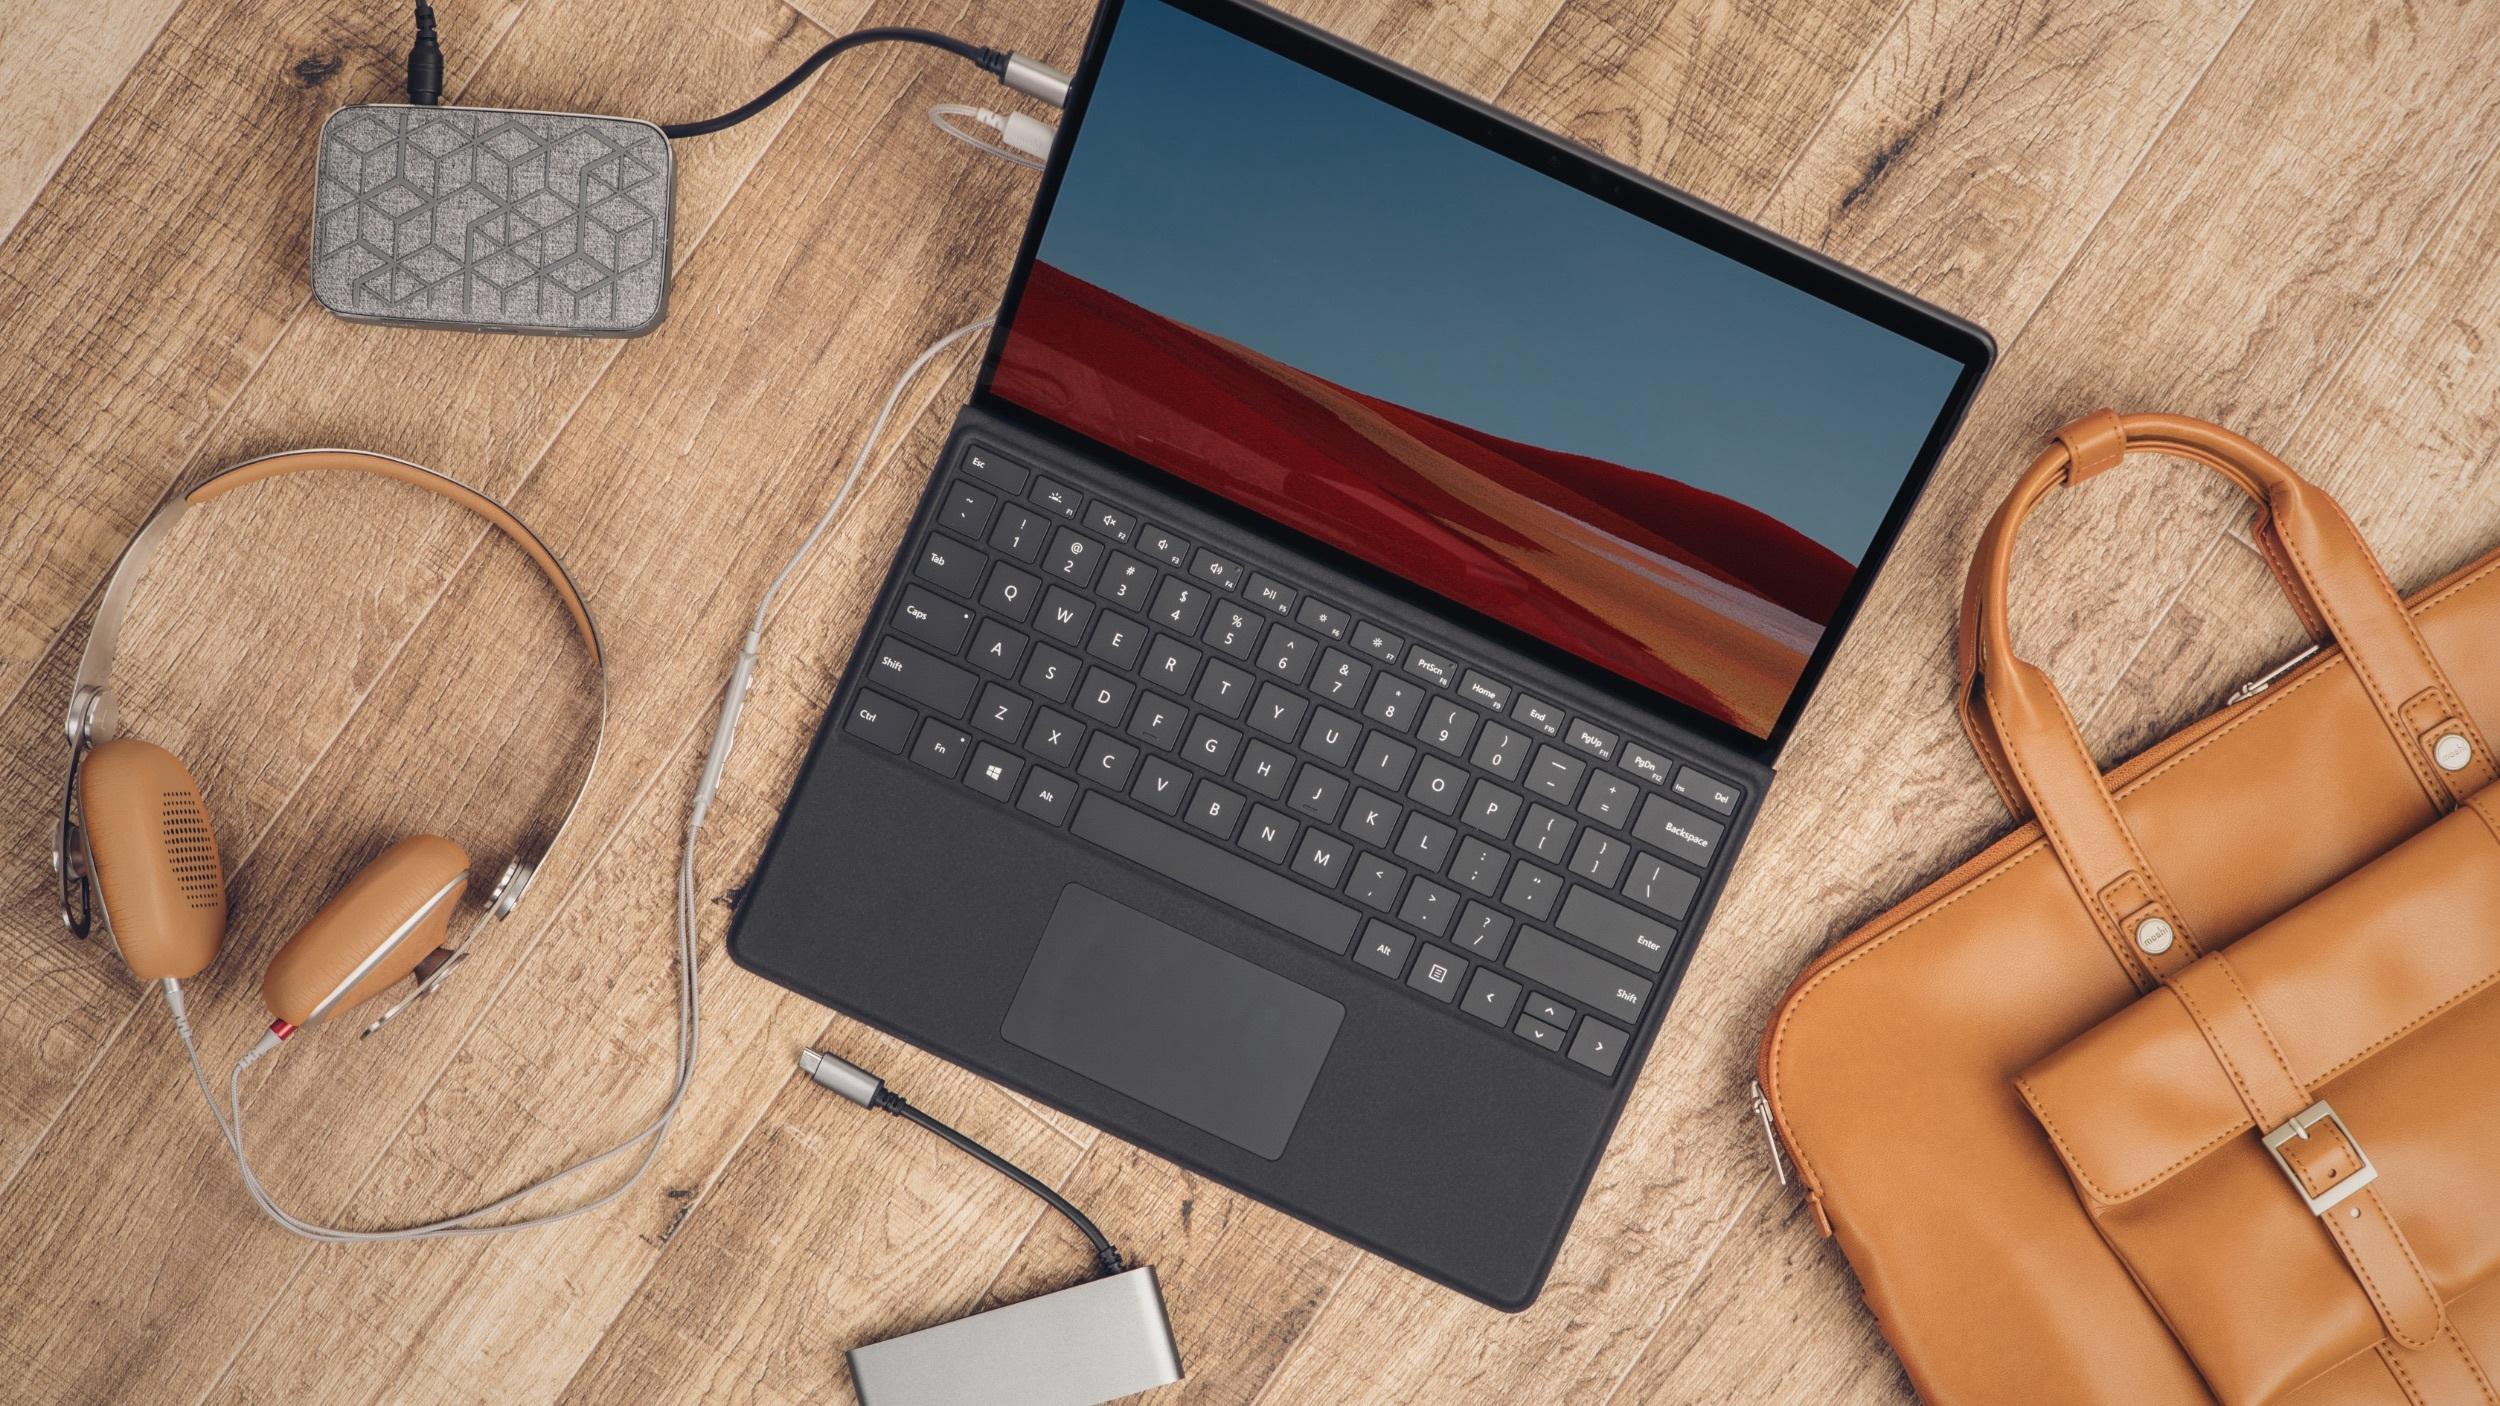 A Surface Pro device surrounded by compatible Moshi products; Avanti C headphones, Symbus Q USB-C hub, Symbus Mini 7-in-1 hub, Treya briefcase